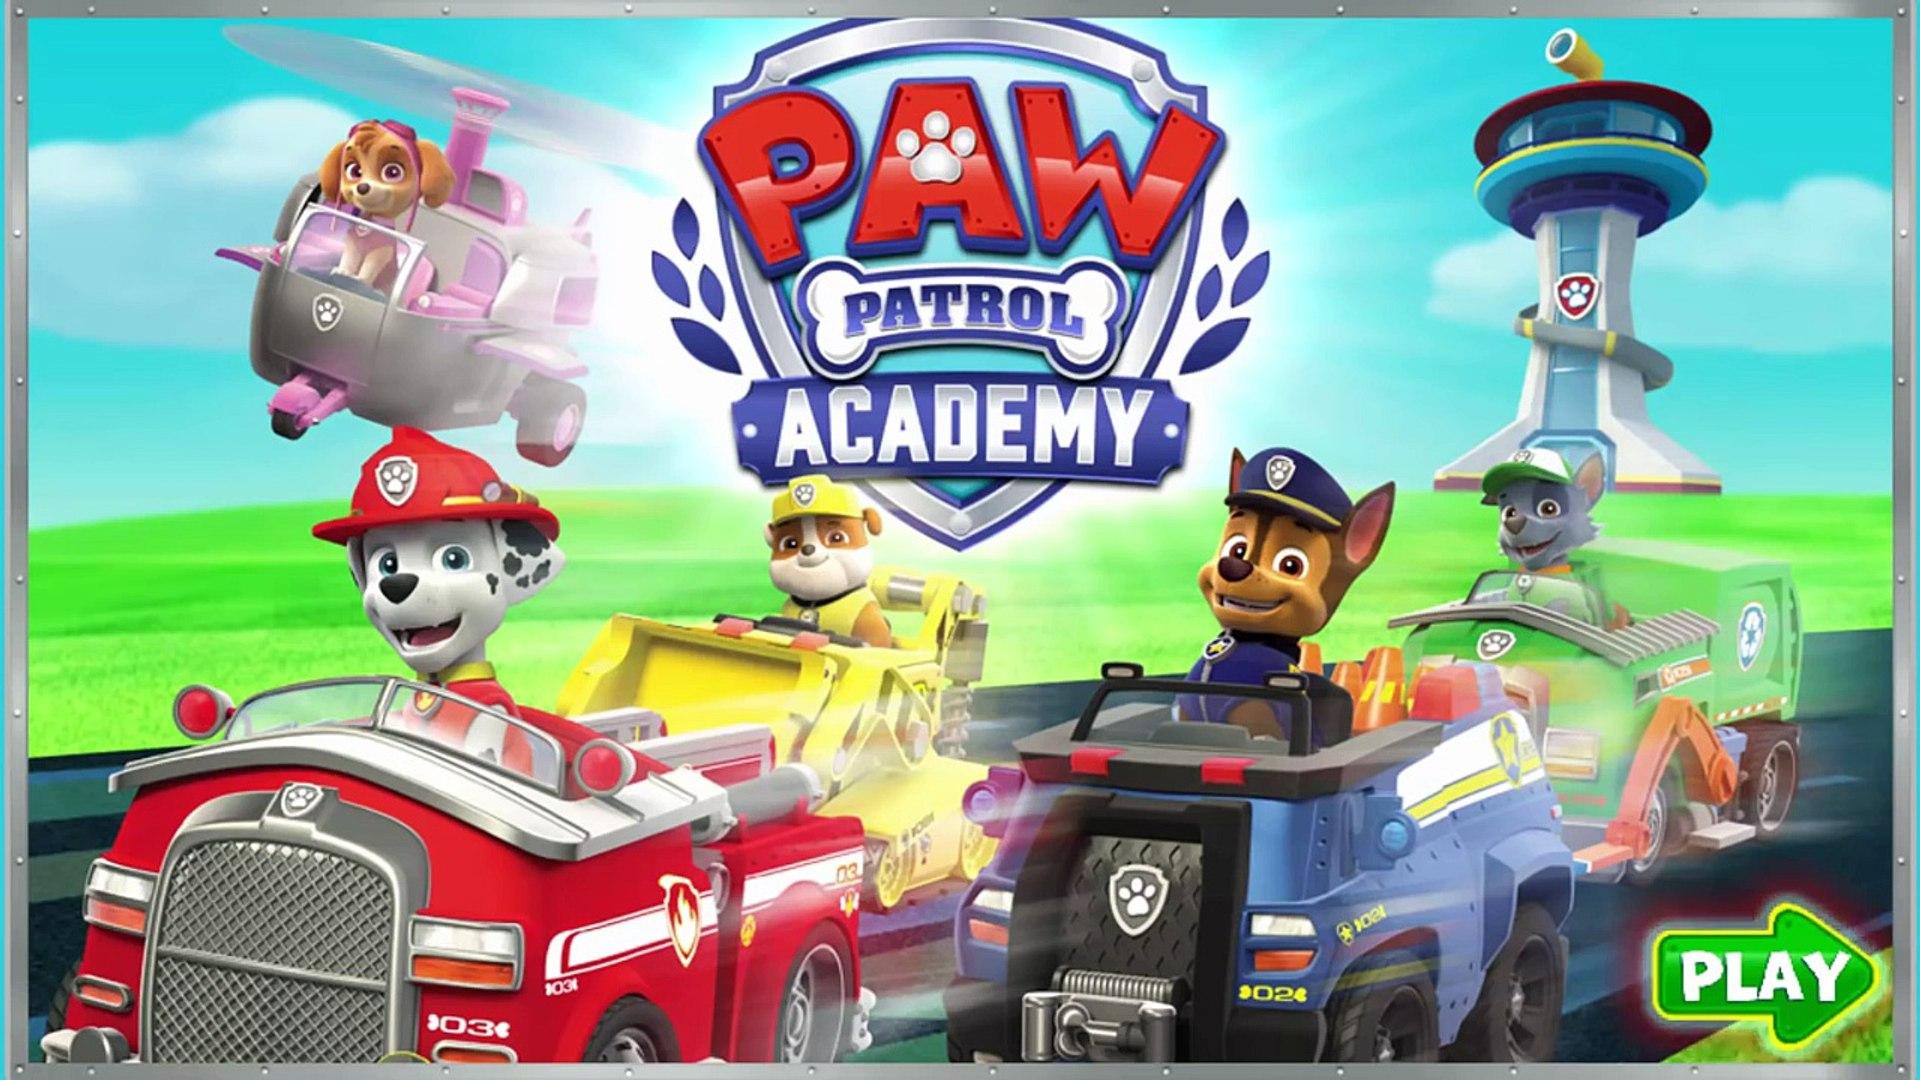 Nick JR Paw Patrol Academy Game - Paw Patrol Cartoon Nick JR - PAW Patrol English 2016 HD